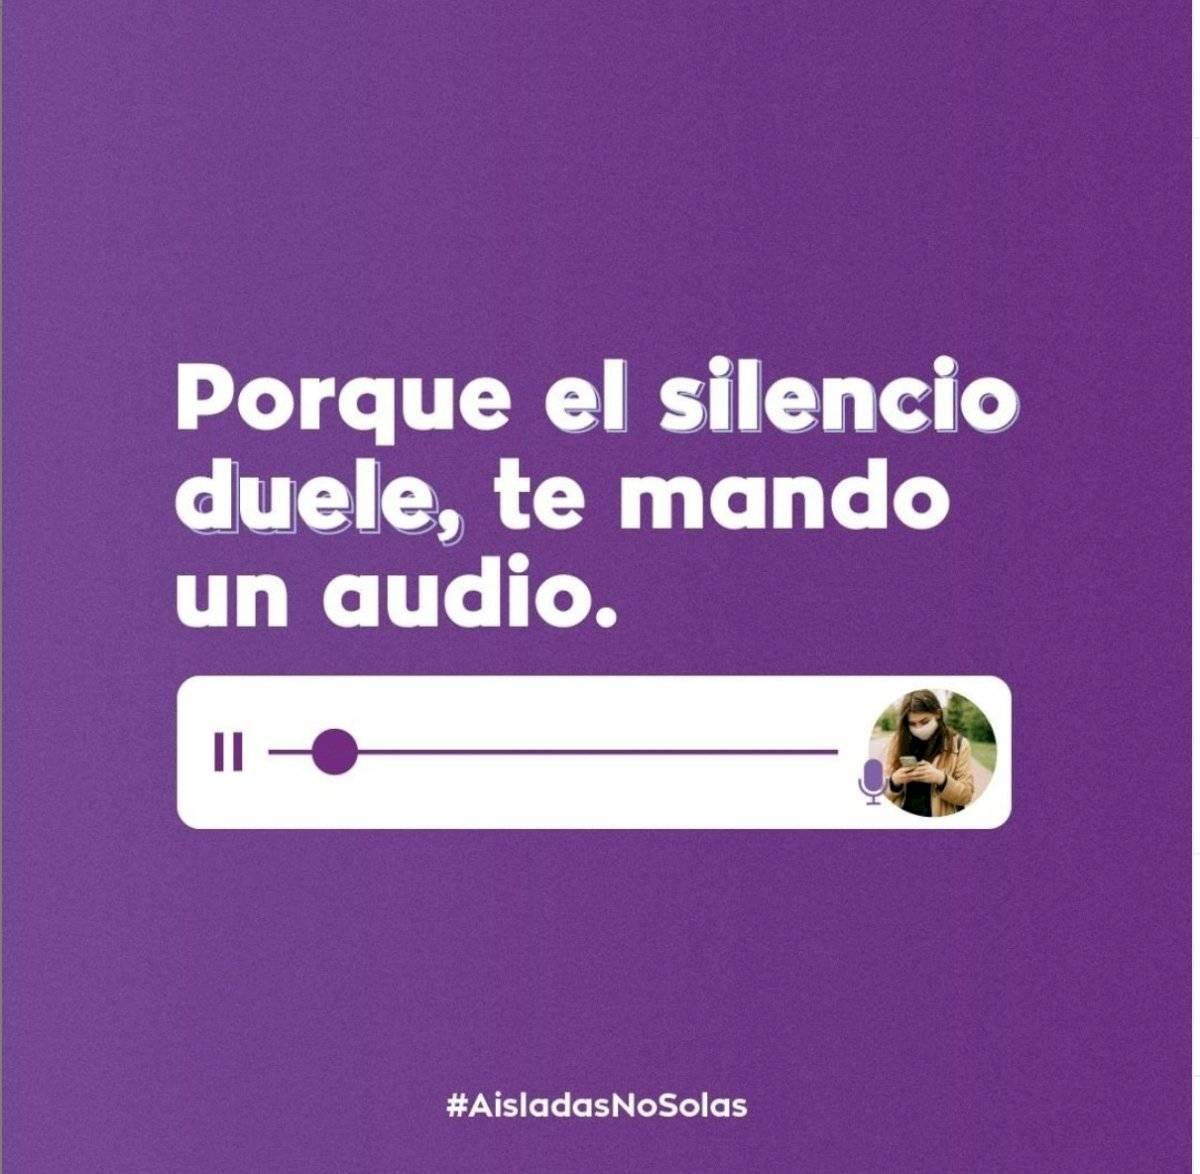 Mandame un audio